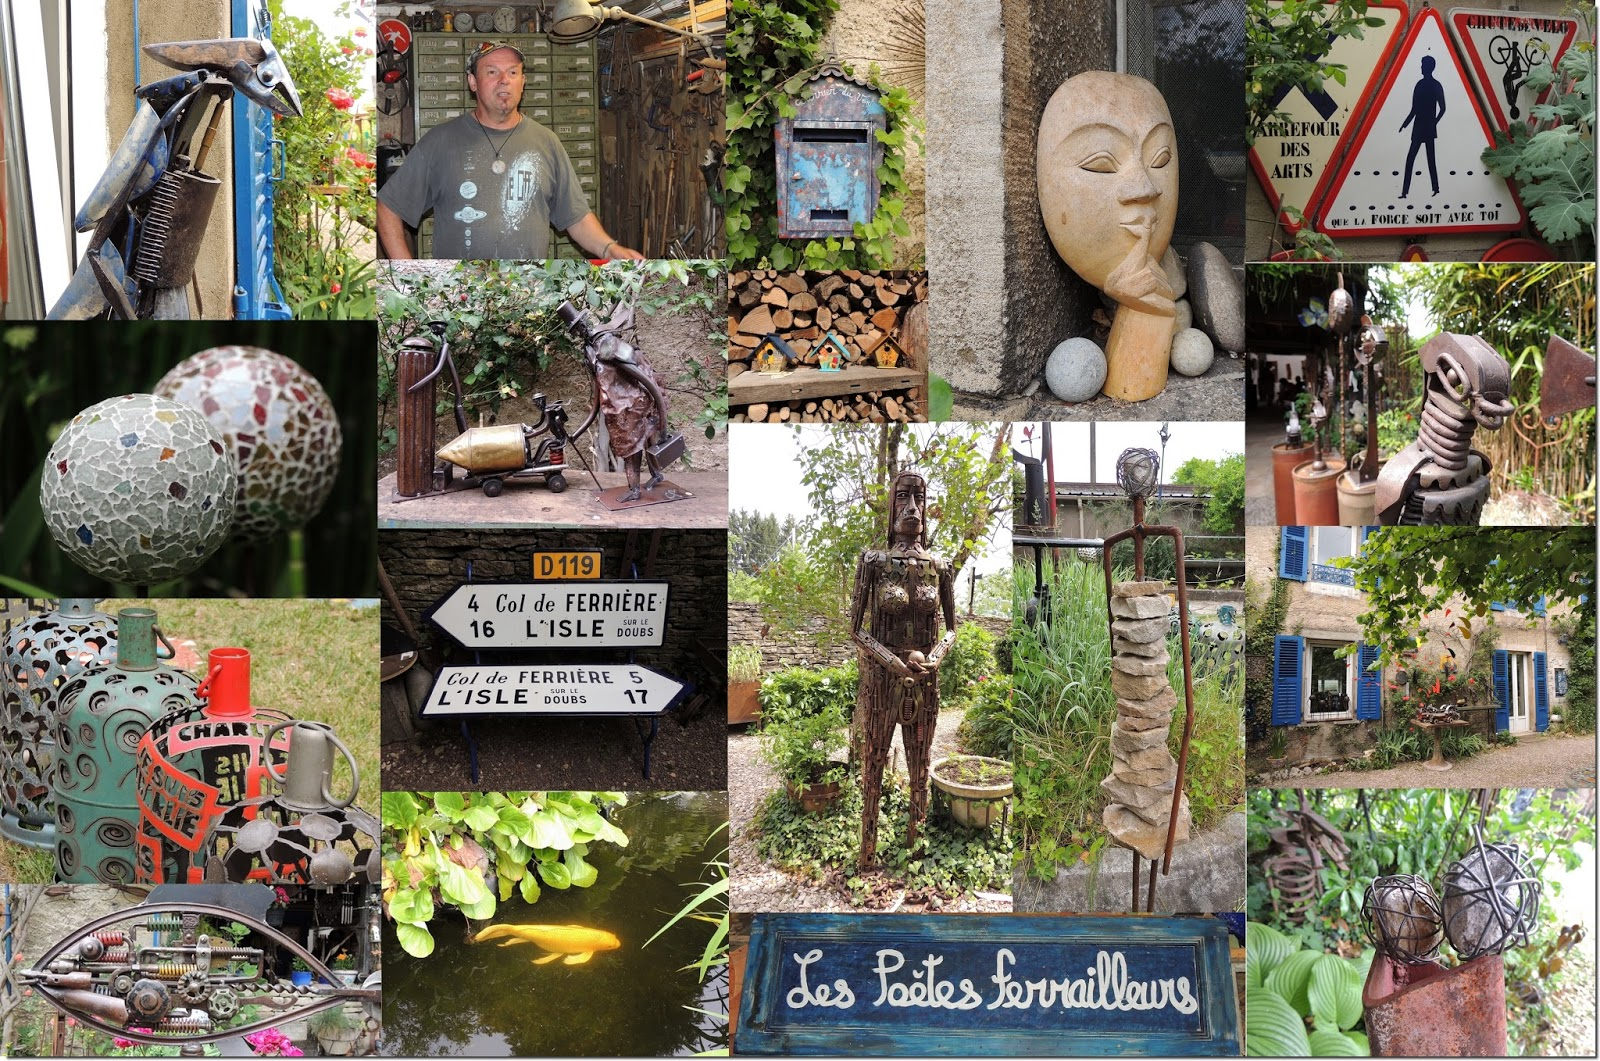 Babzy photos blog c 39 est un jardin extraodinaire for C est un jardin